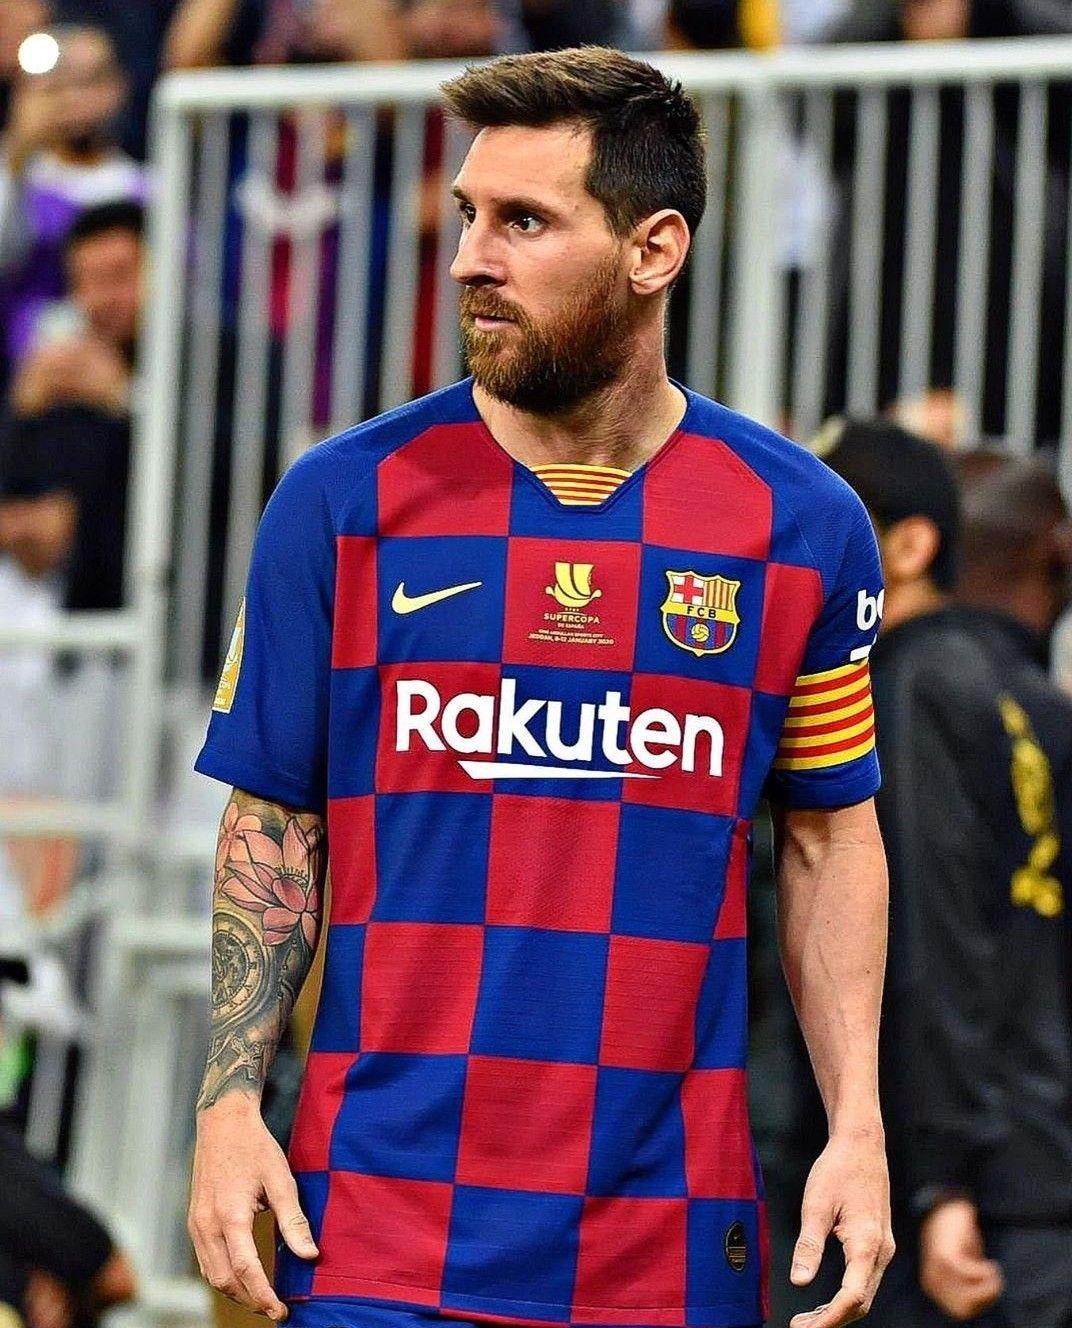 Pin de Murano Sports Deportes, Rece en Leo Messi en 2020